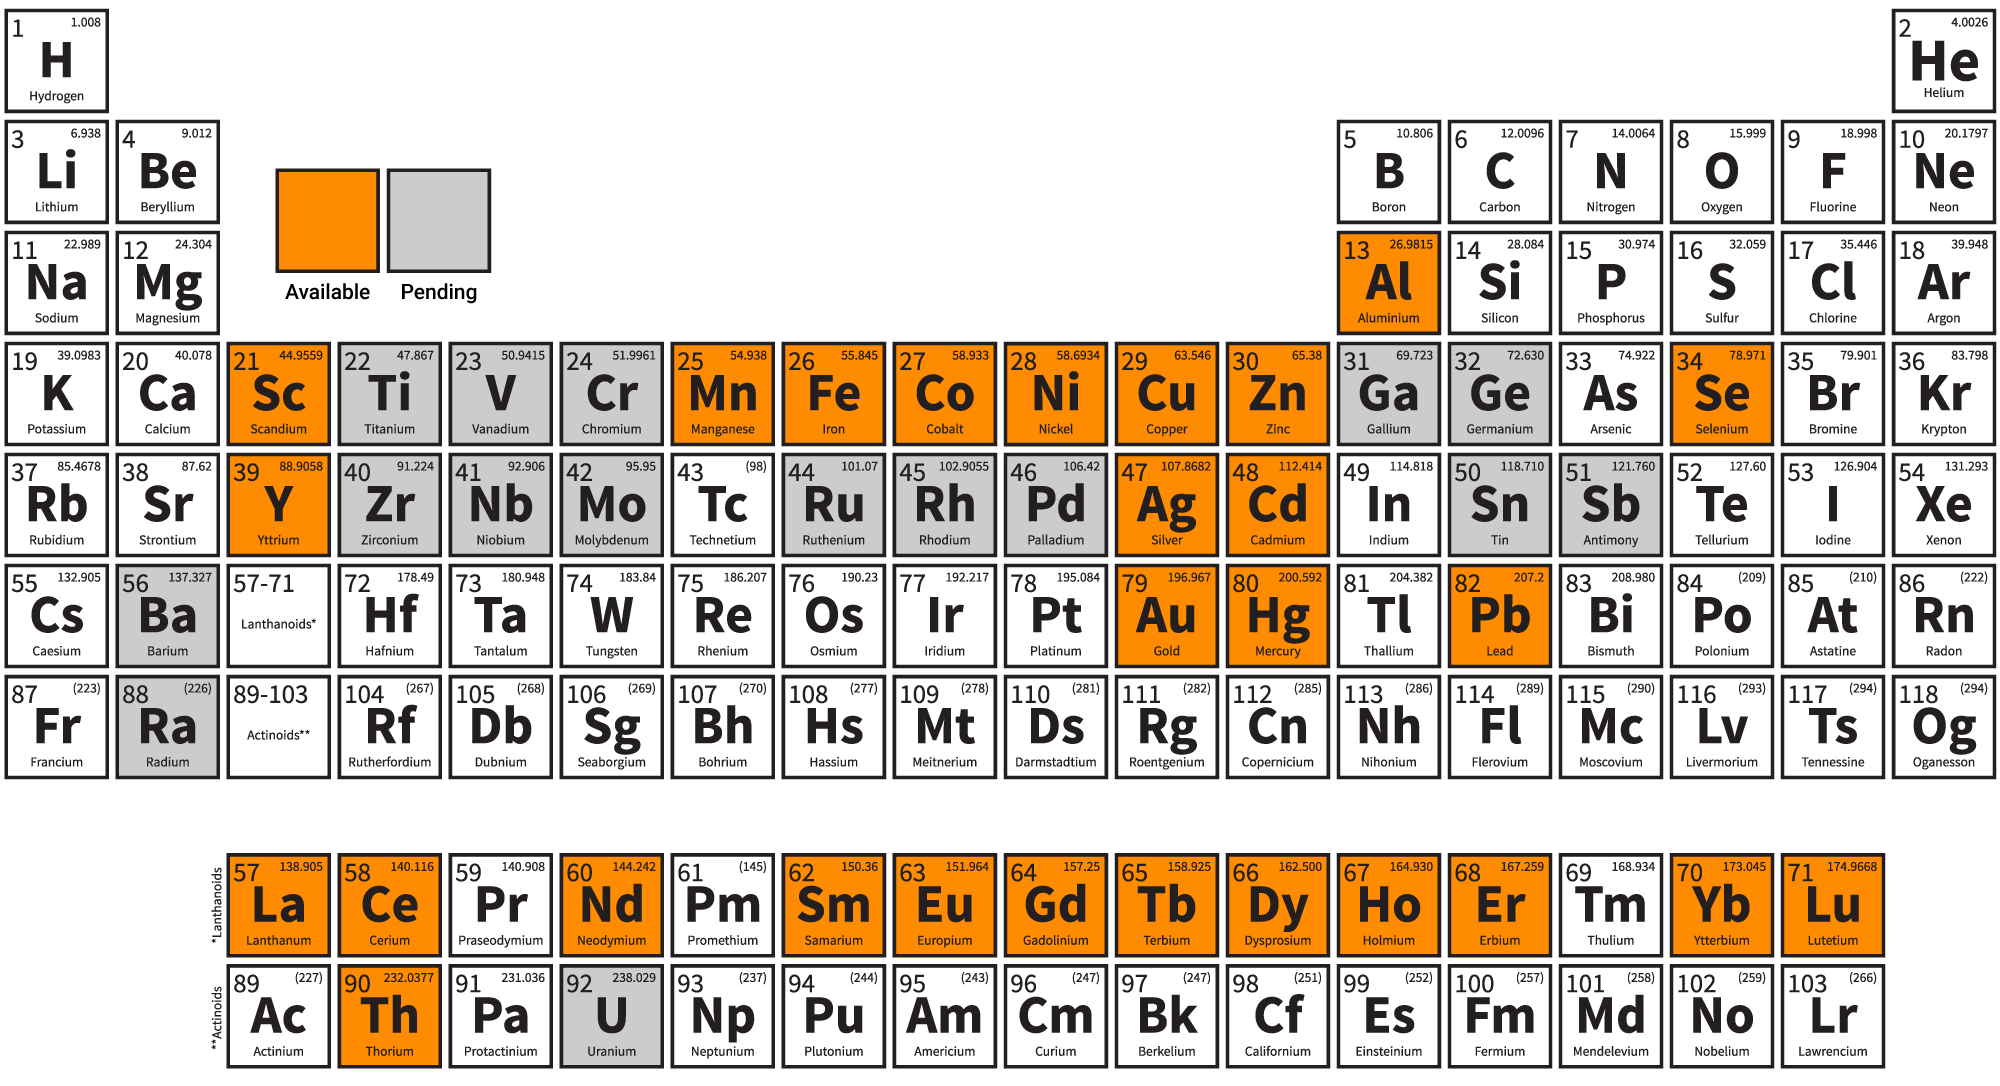 Chelok-bindable-metals-periodic-table